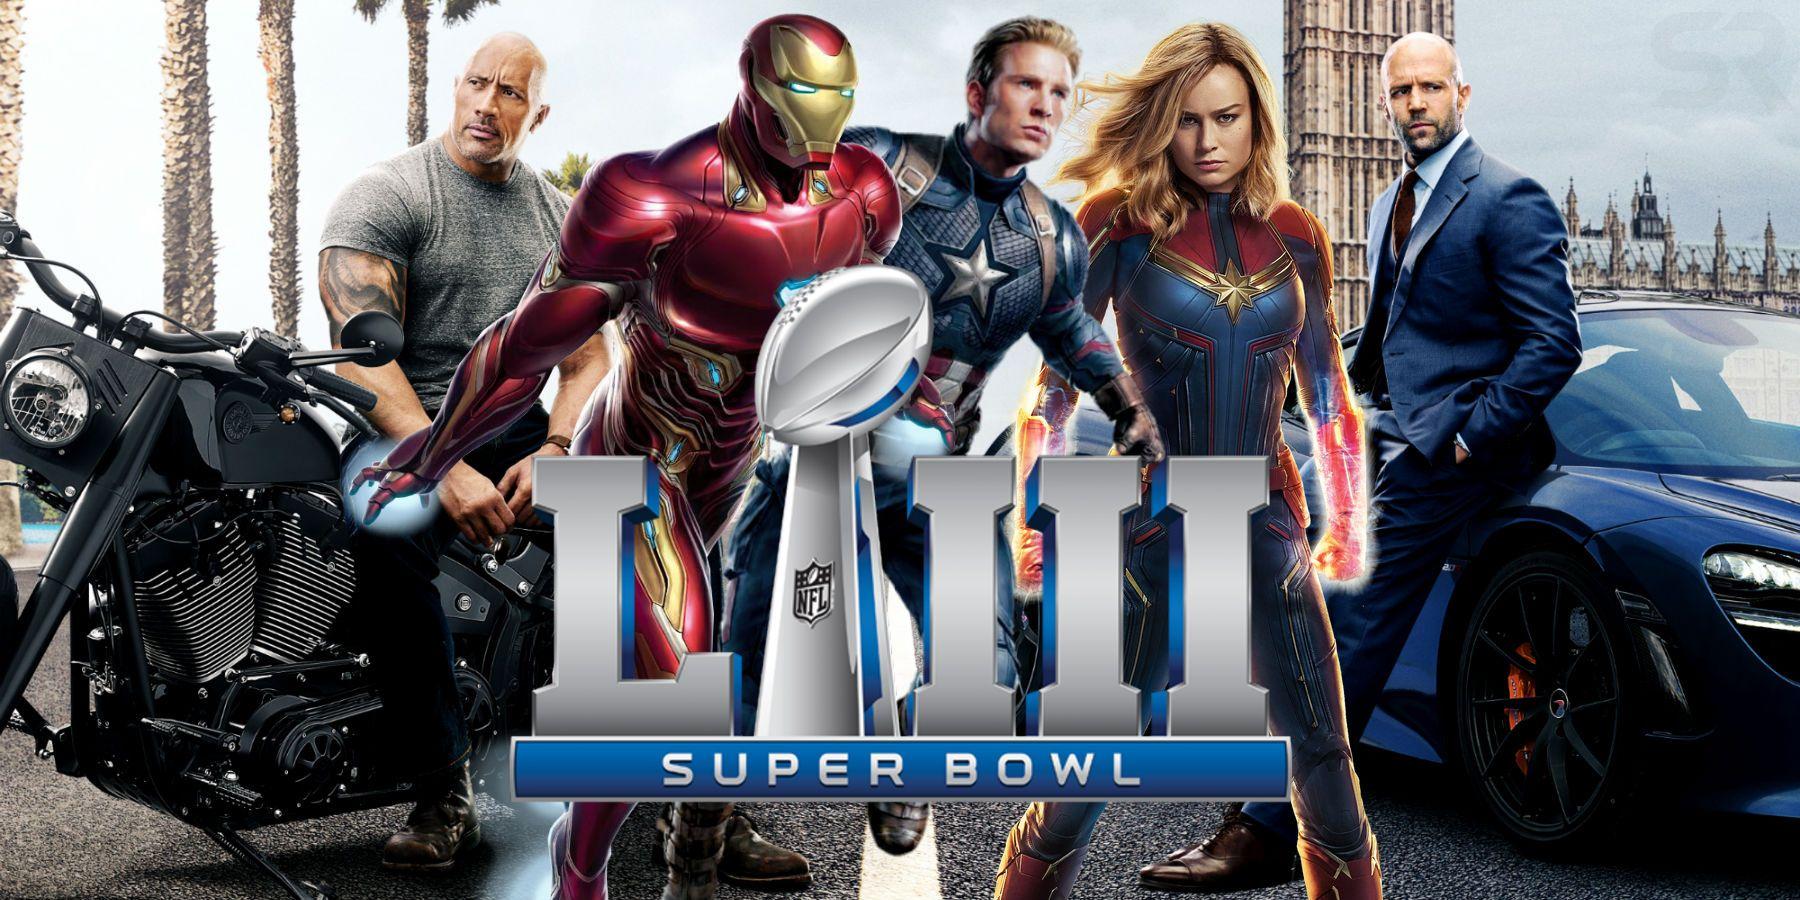 https://static1.srcdn.com/wordpress/wp-content/uploads/2019/02/Super-Bowl-2019-Trailers.jpg?q=50&fit=crop&w=798&h=407